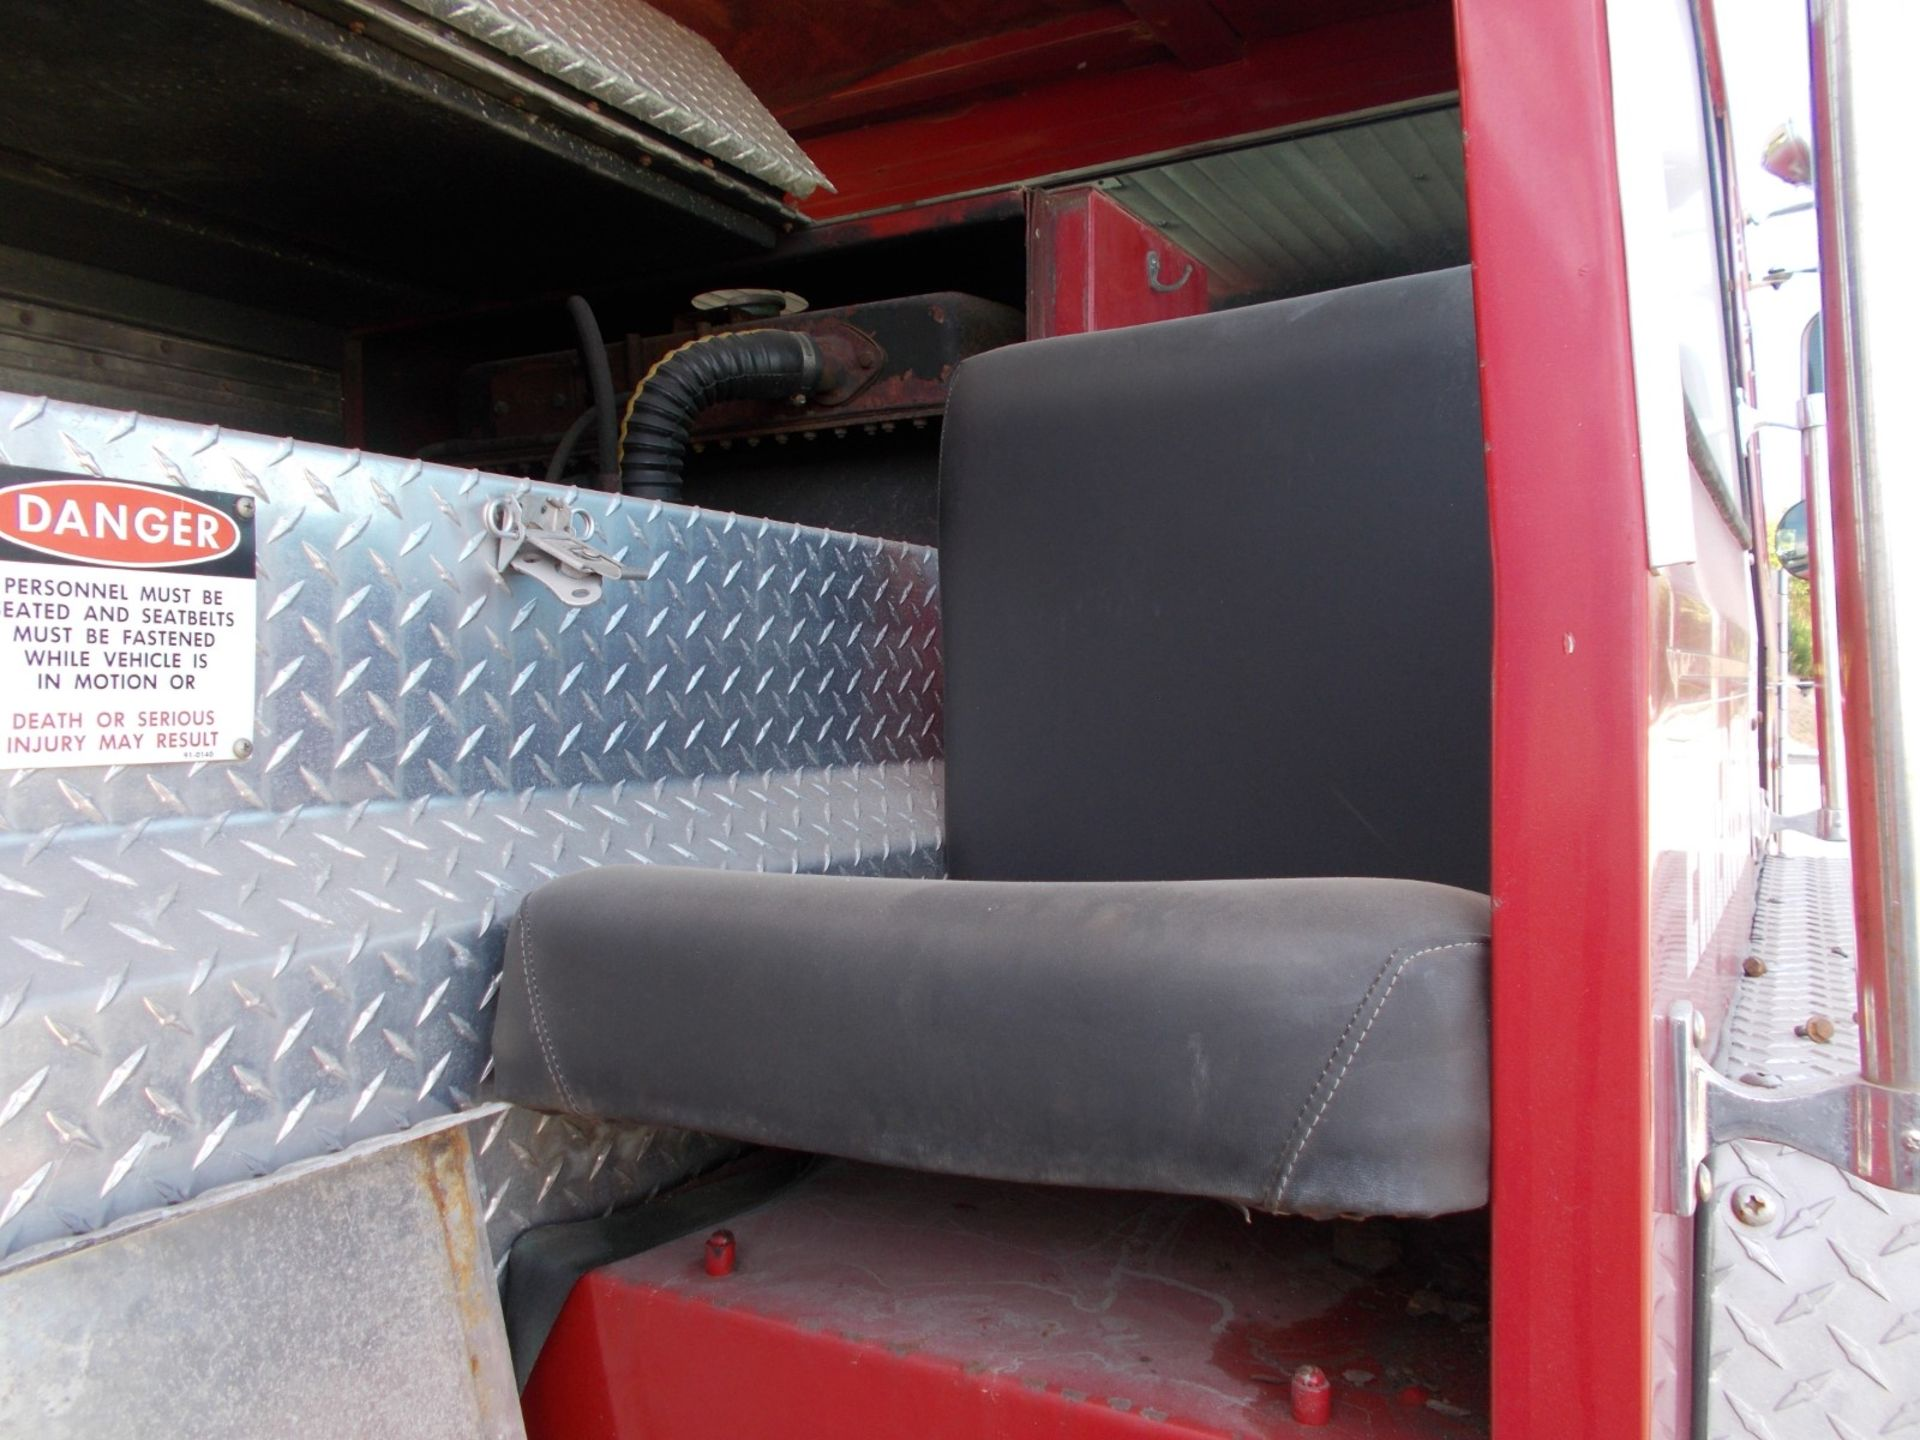 1978 HENDRICKSON 871-LPS SNORKEL FIRE TRUCK, U.S. IMPORT, 7.0 LITRE DETROIT DIESEL ENGINE *PLUS VAT* - Image 11 of 22